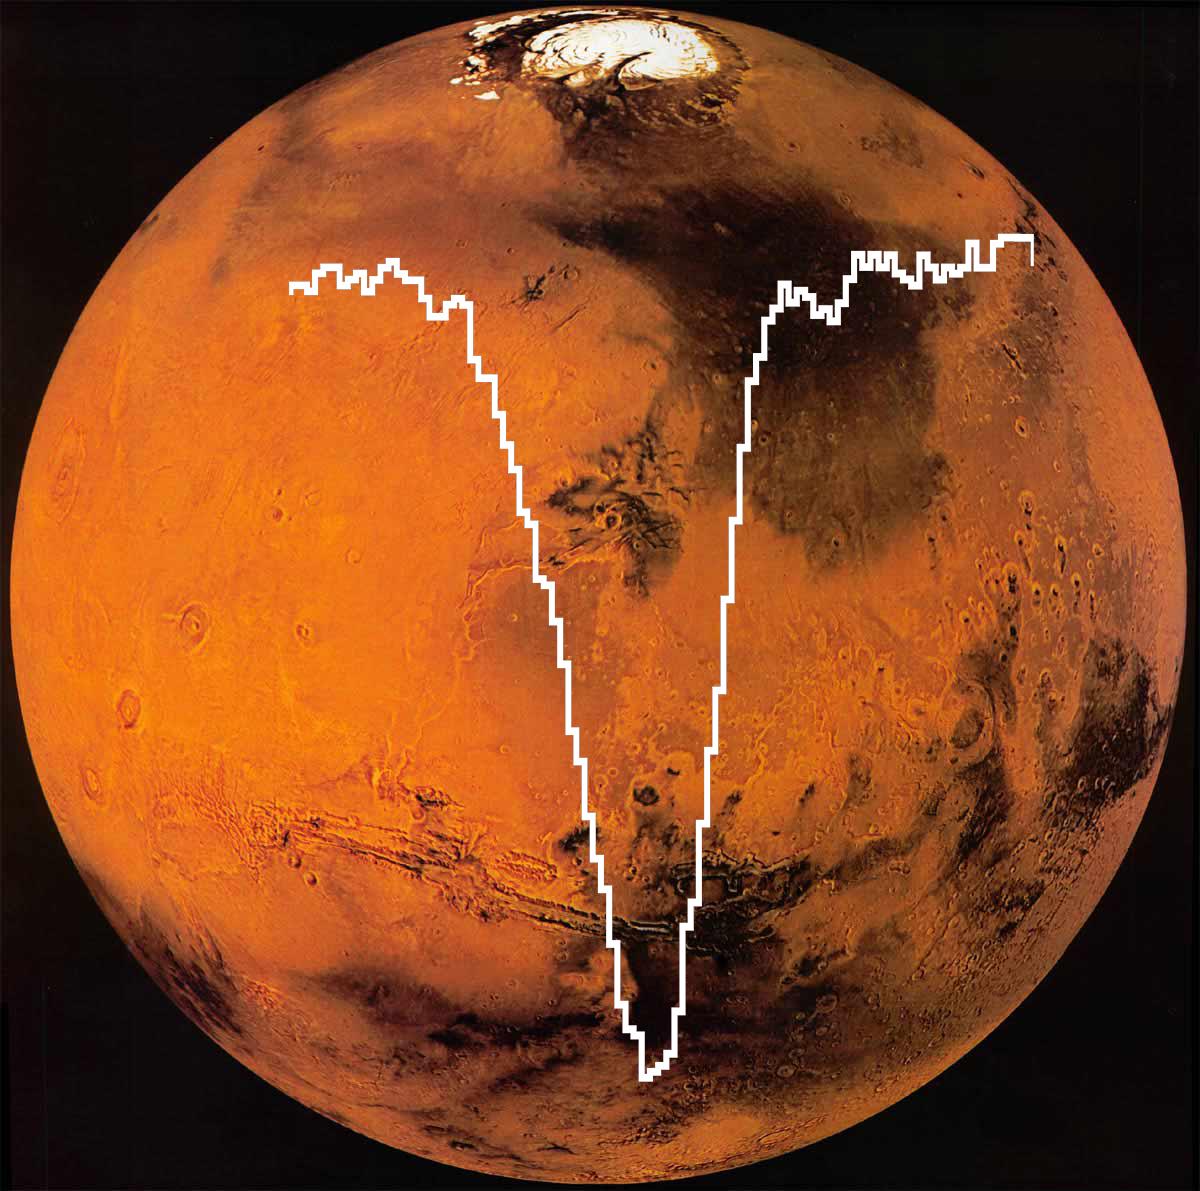 SOFIA's measurement signature superimposed on Mars' atmosphere